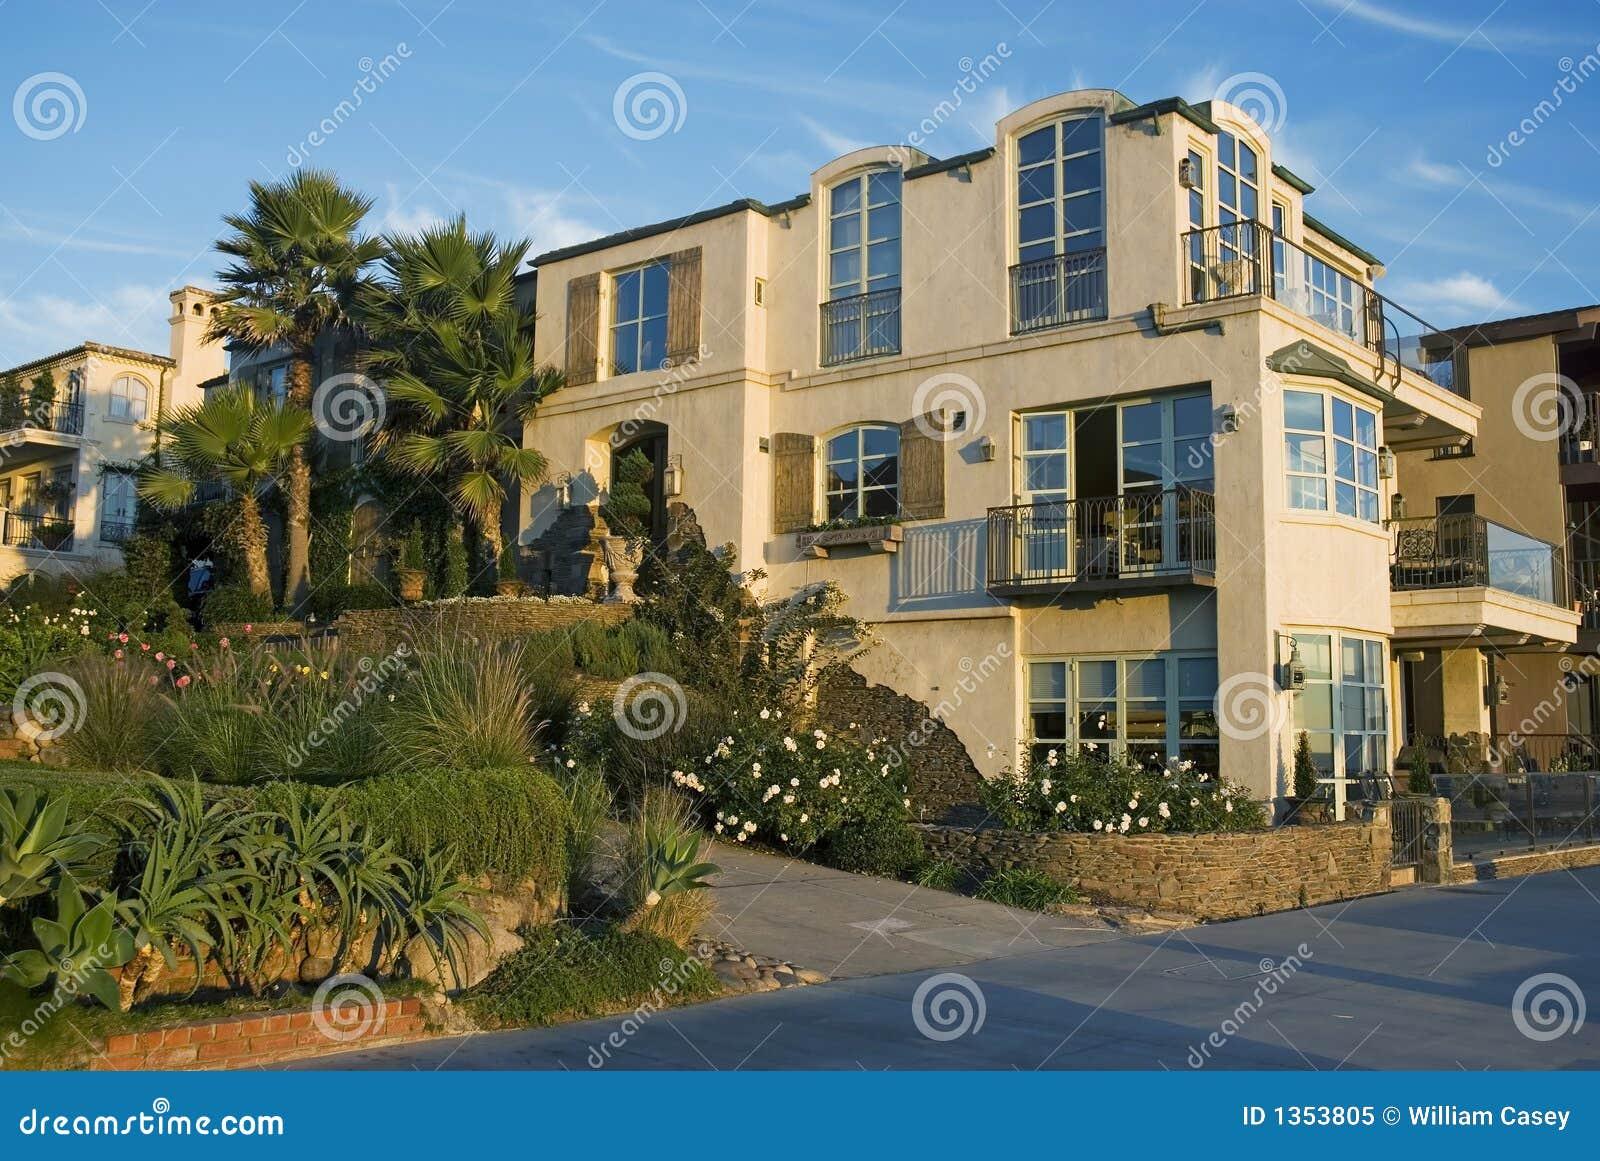 Mediterranean Villa Royalty Free Stock Photo Image 1353805